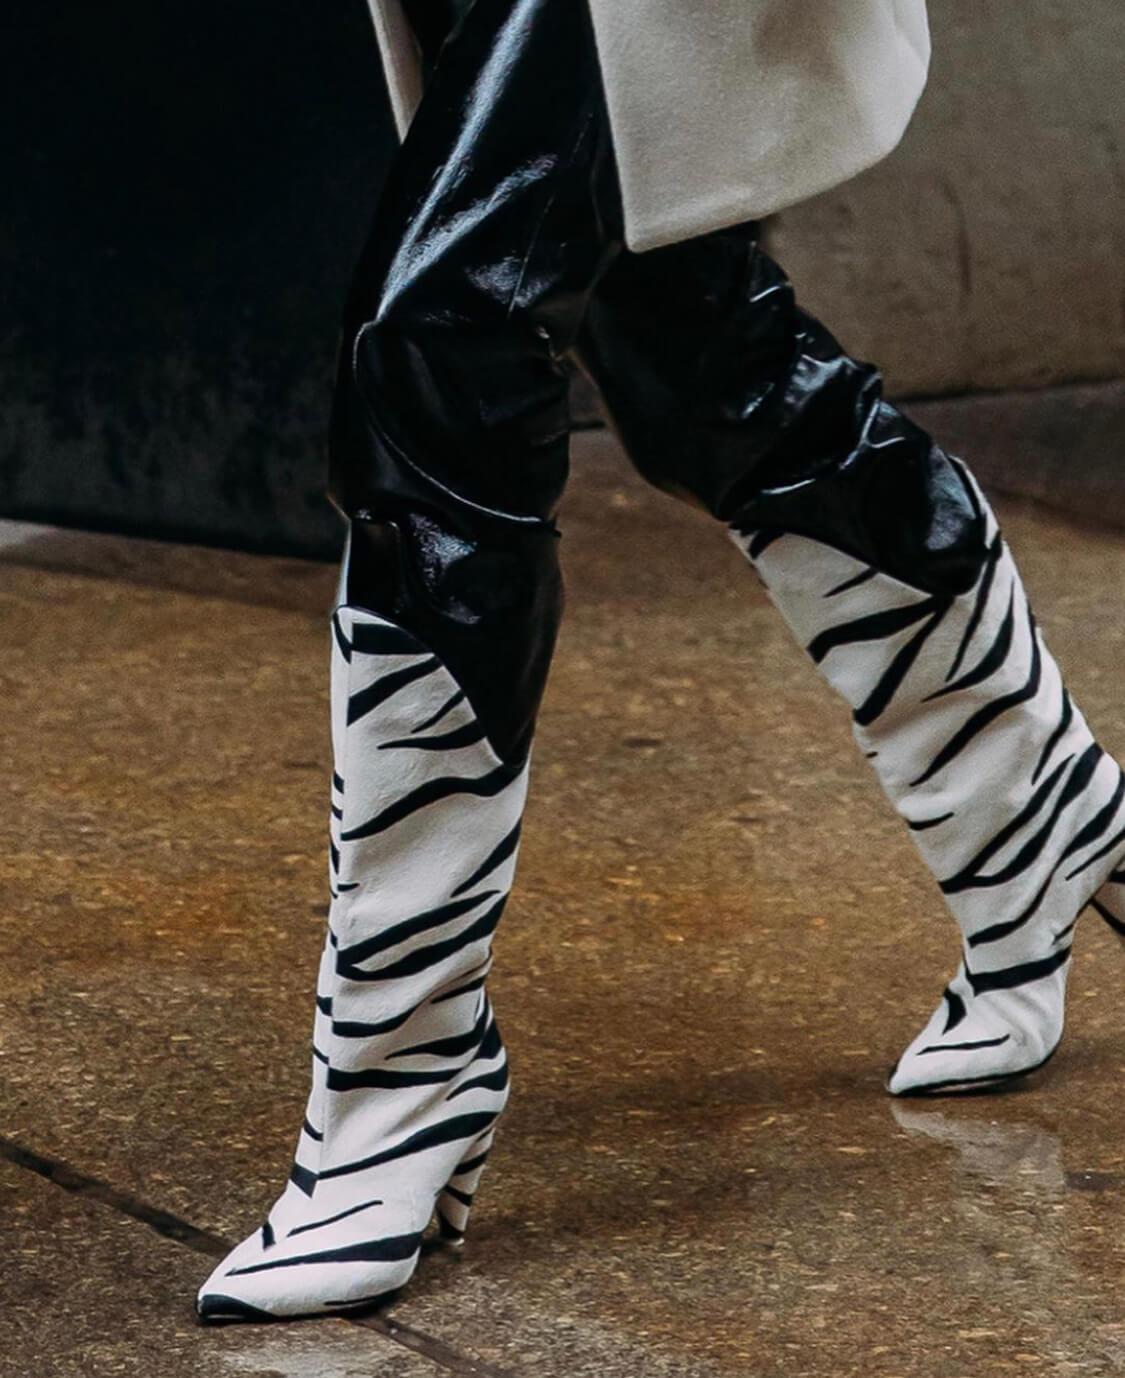 botas de cebra tendencia